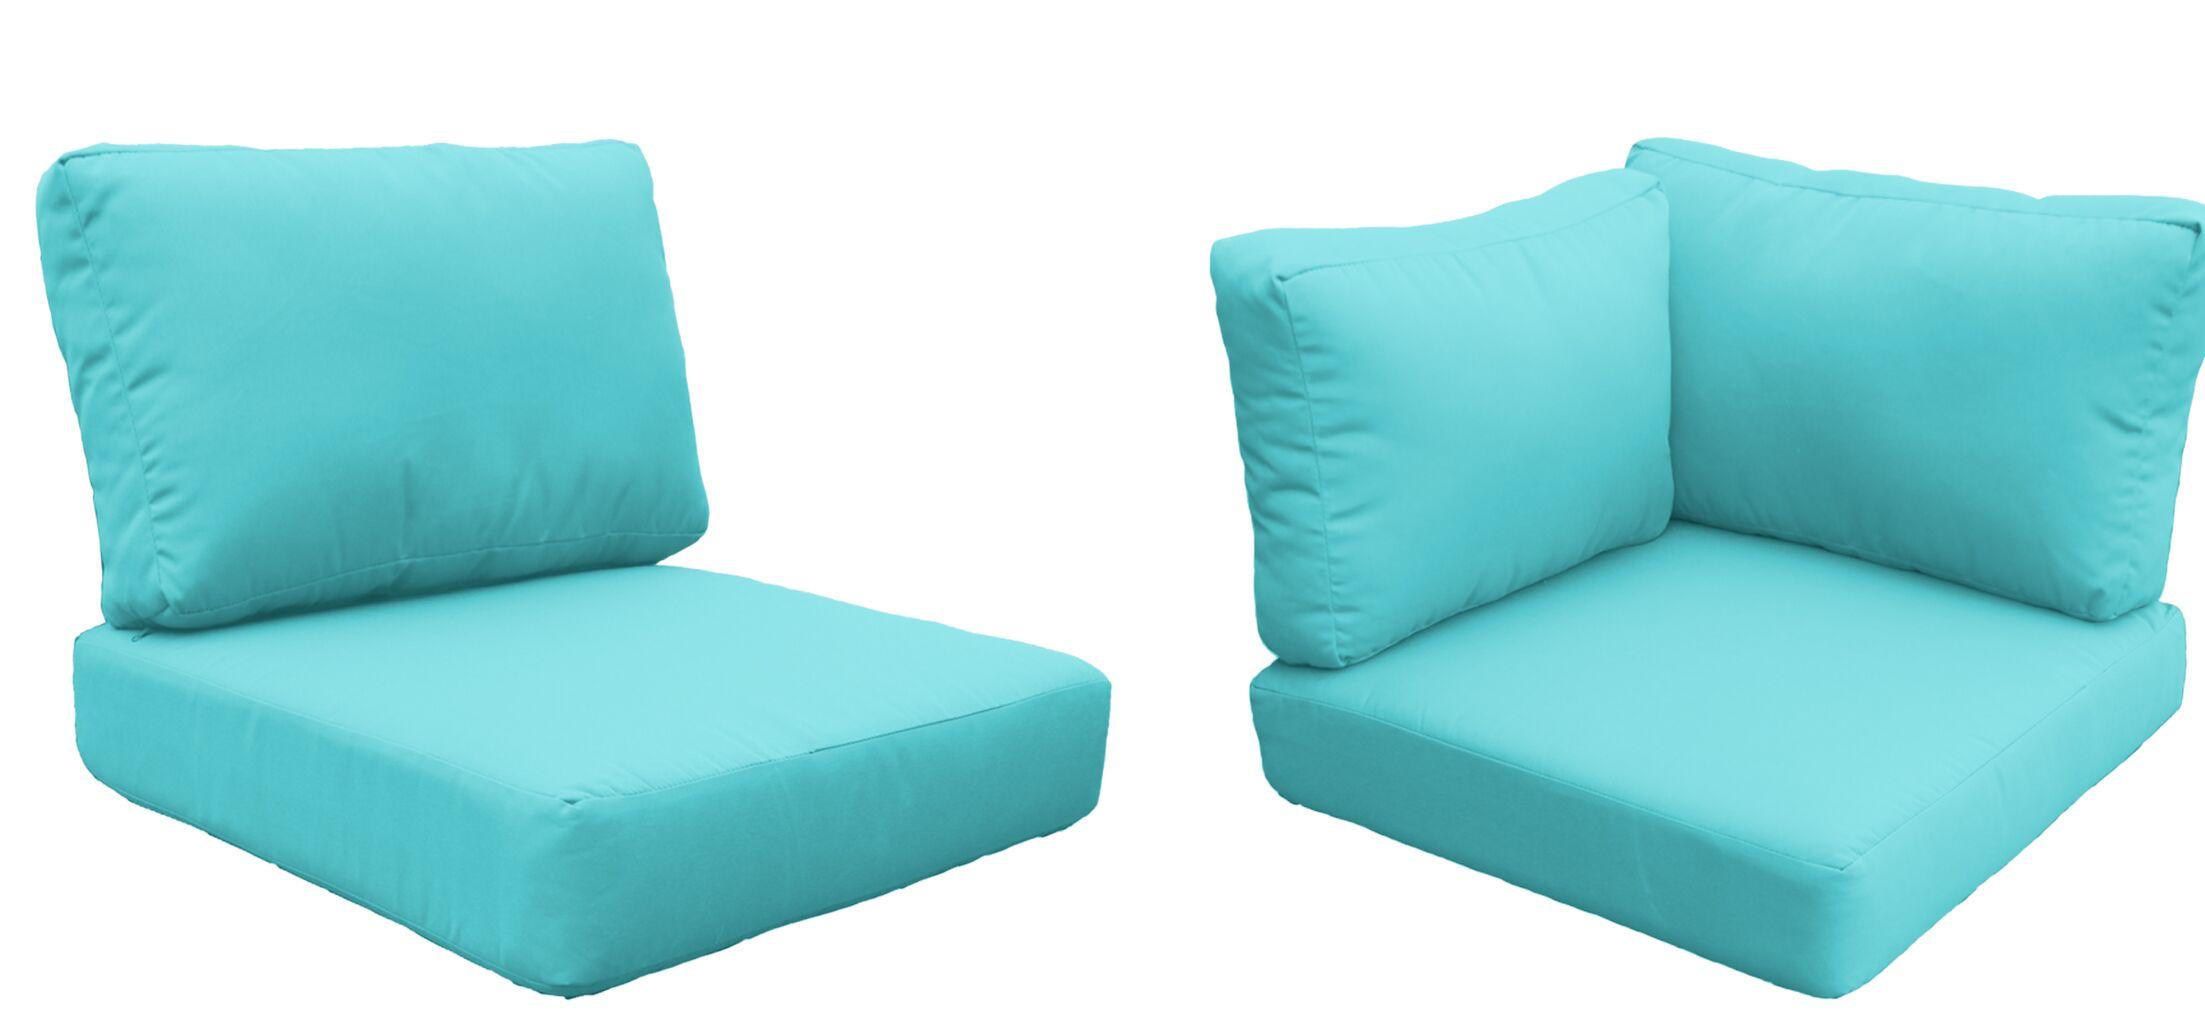 Eldredge Outdoor 17 Piece Lounge Chair Cushion Set Fabric: Aruba